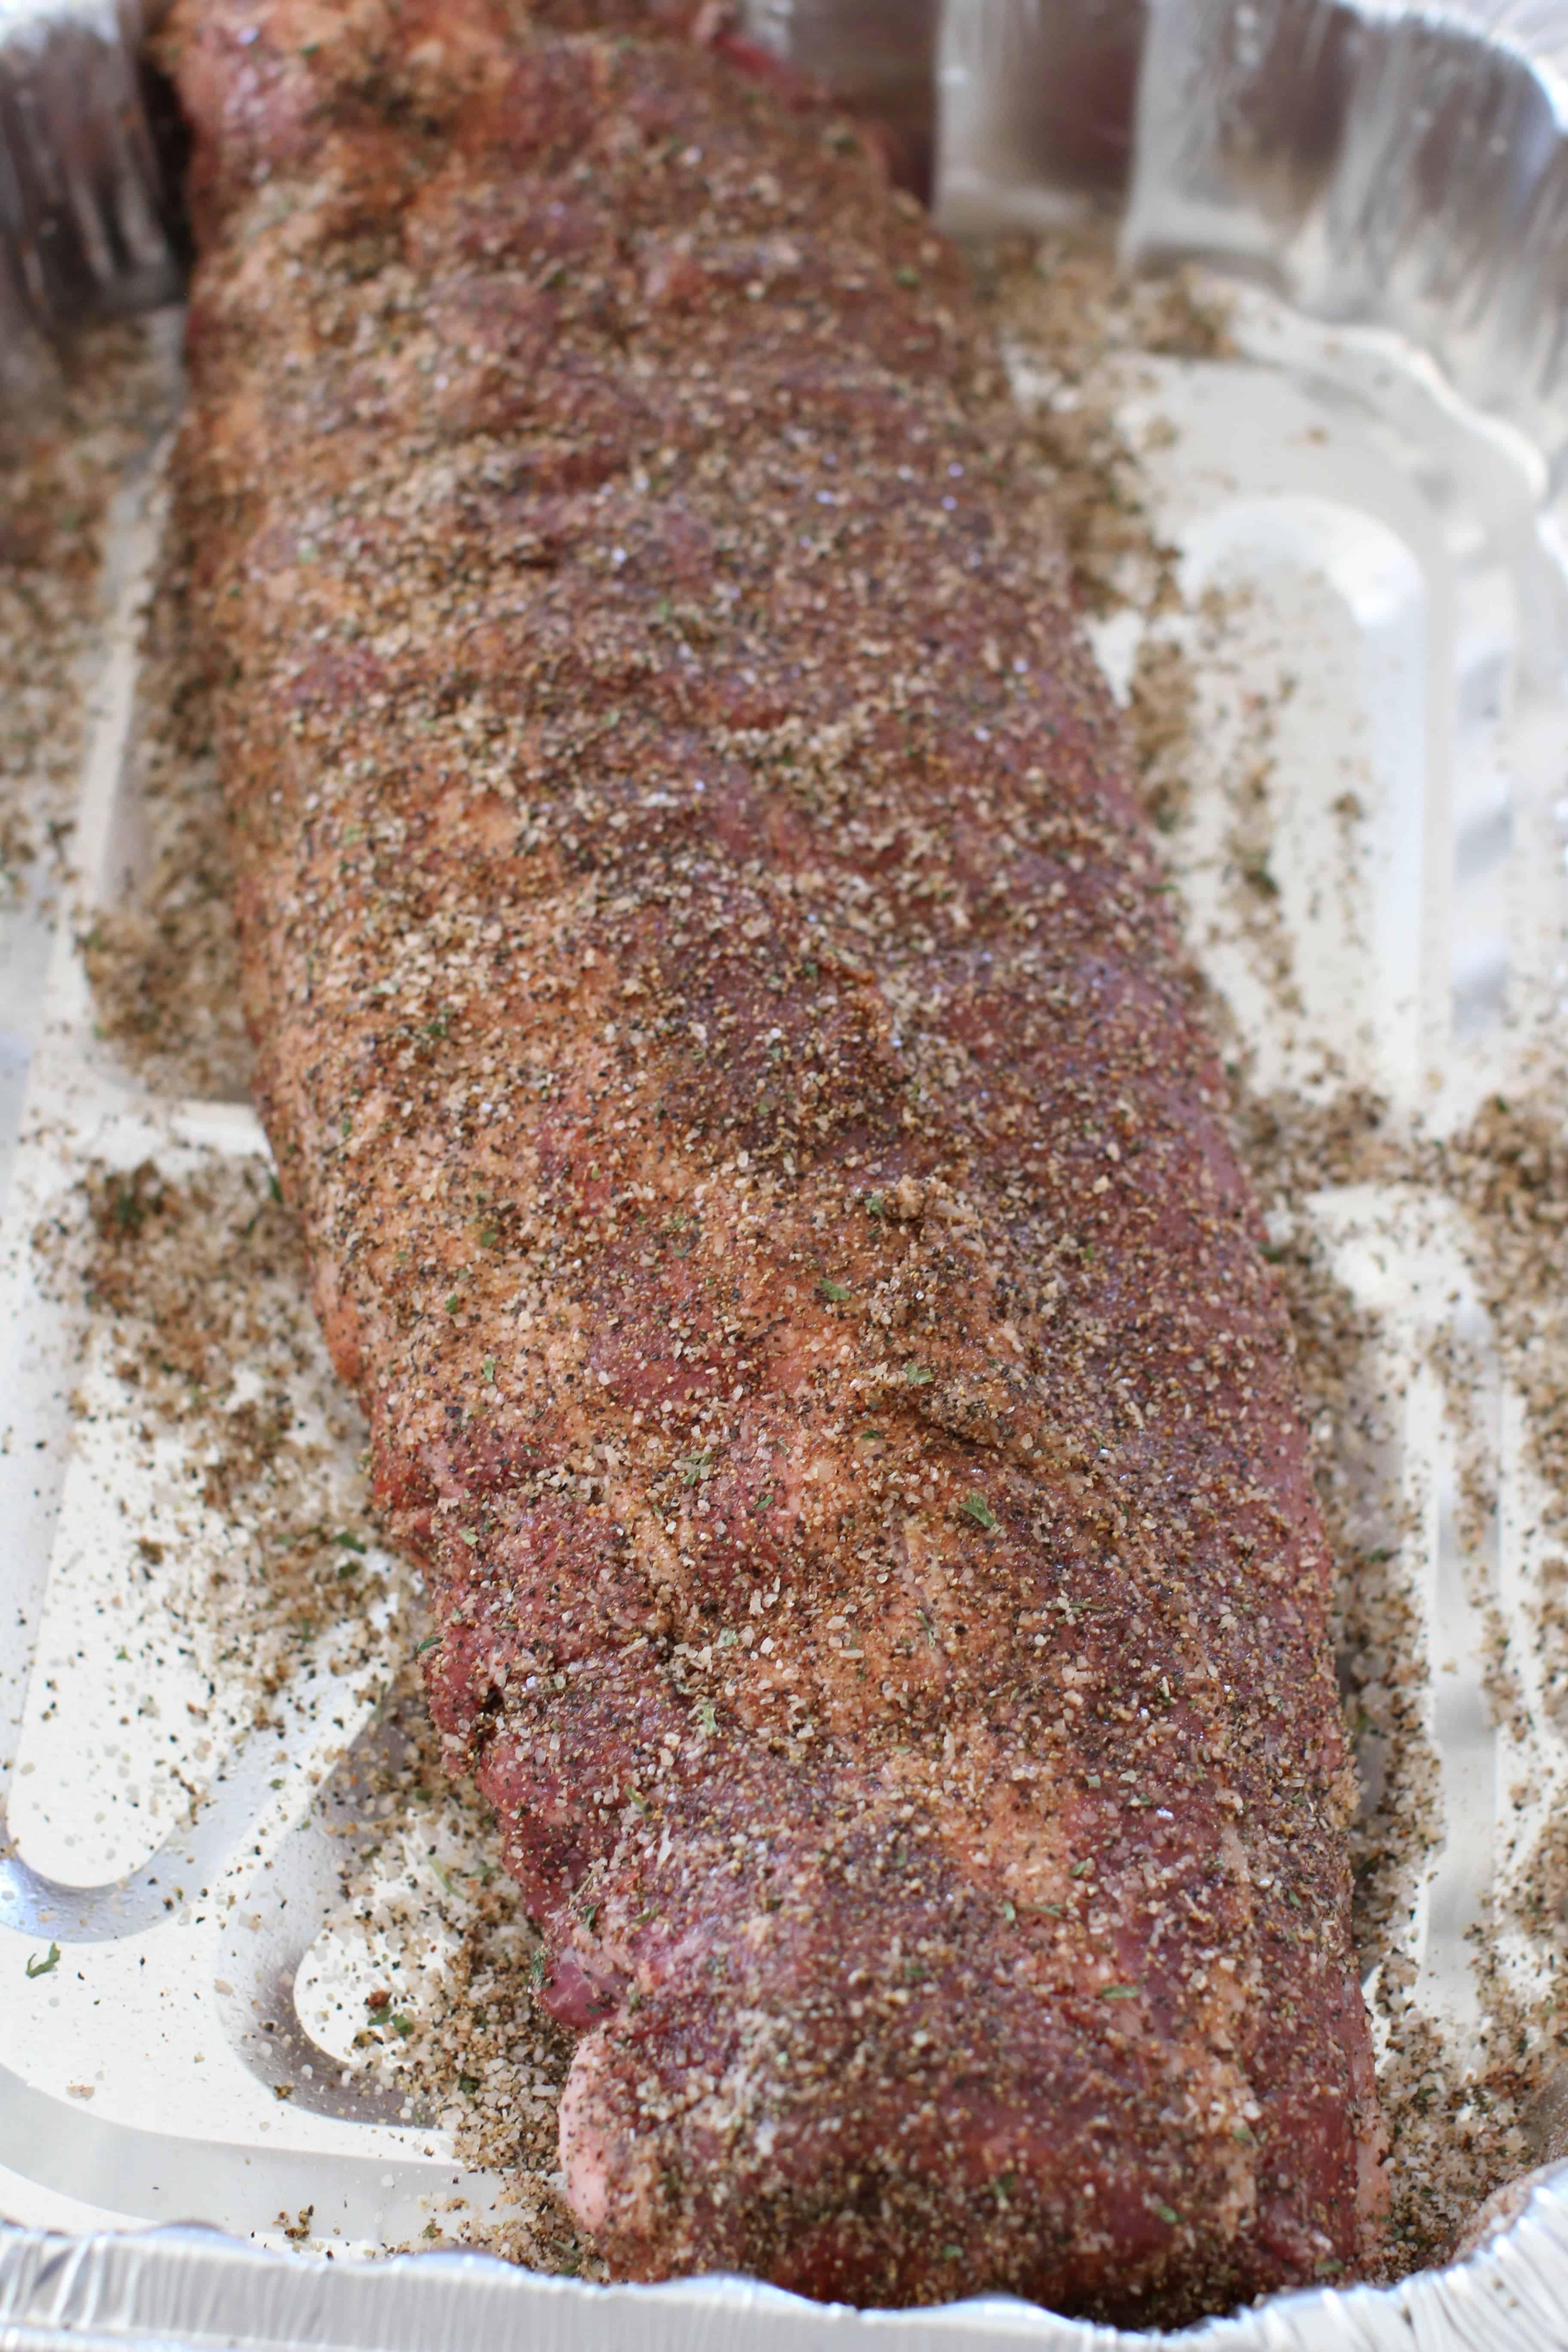 homemade pork bbq run seasoning on rack of ribs shown in an aluminum pan.